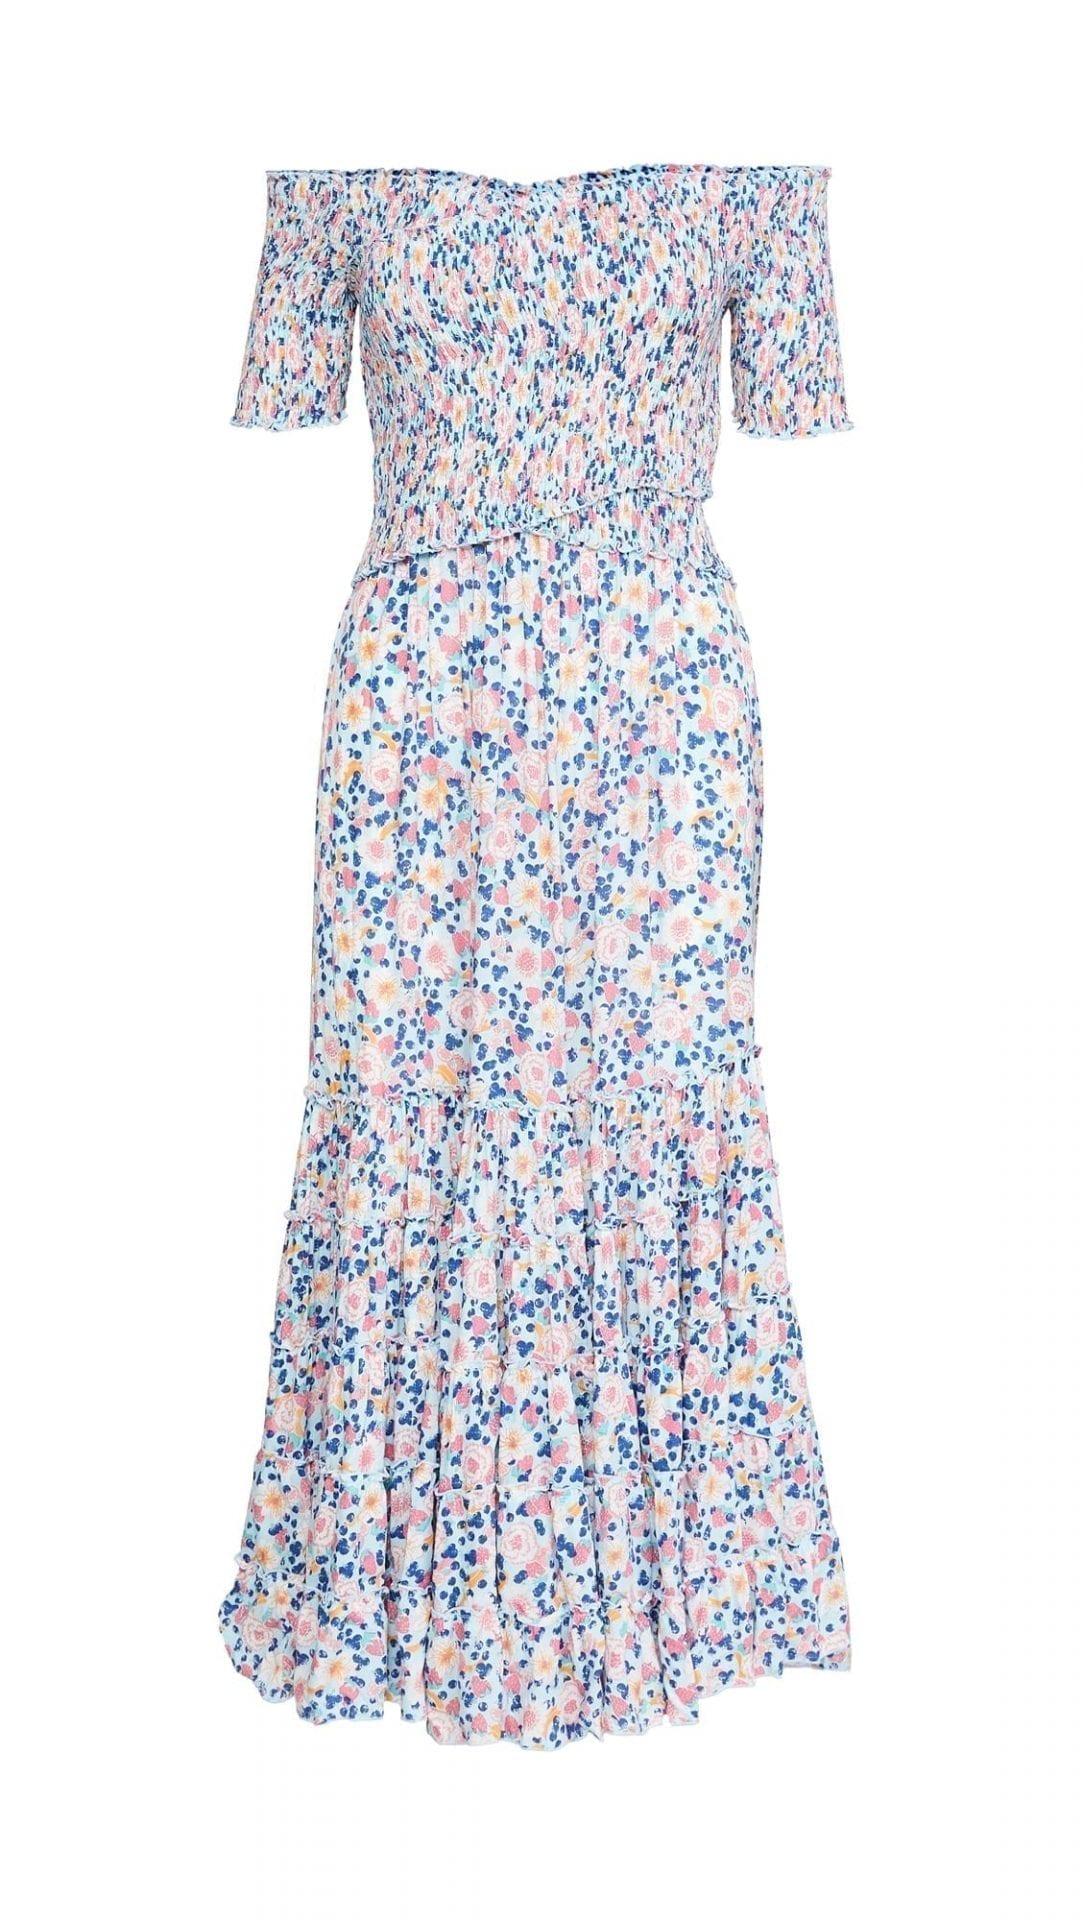 POUPETTE ST BARTH Soledad Midi Dress